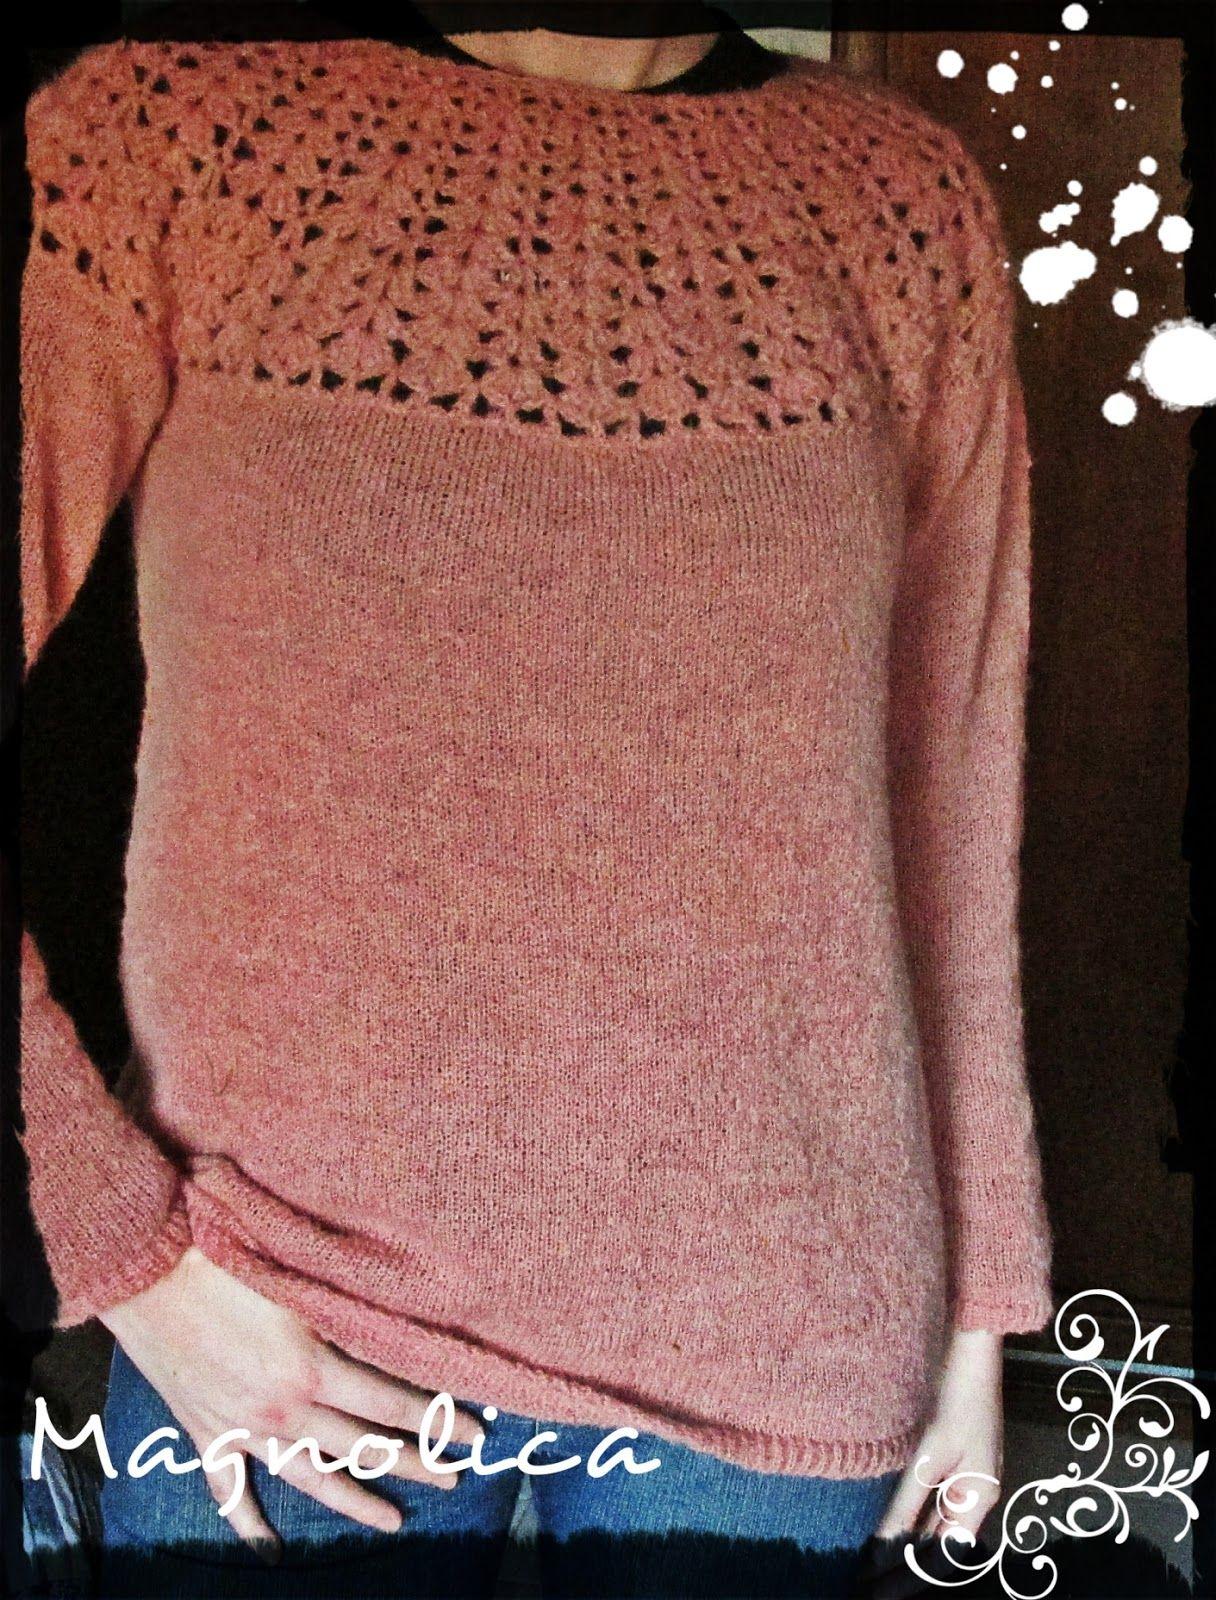 Magnolica: Sweater tejido a maquina combinado con crochet | crochet ...